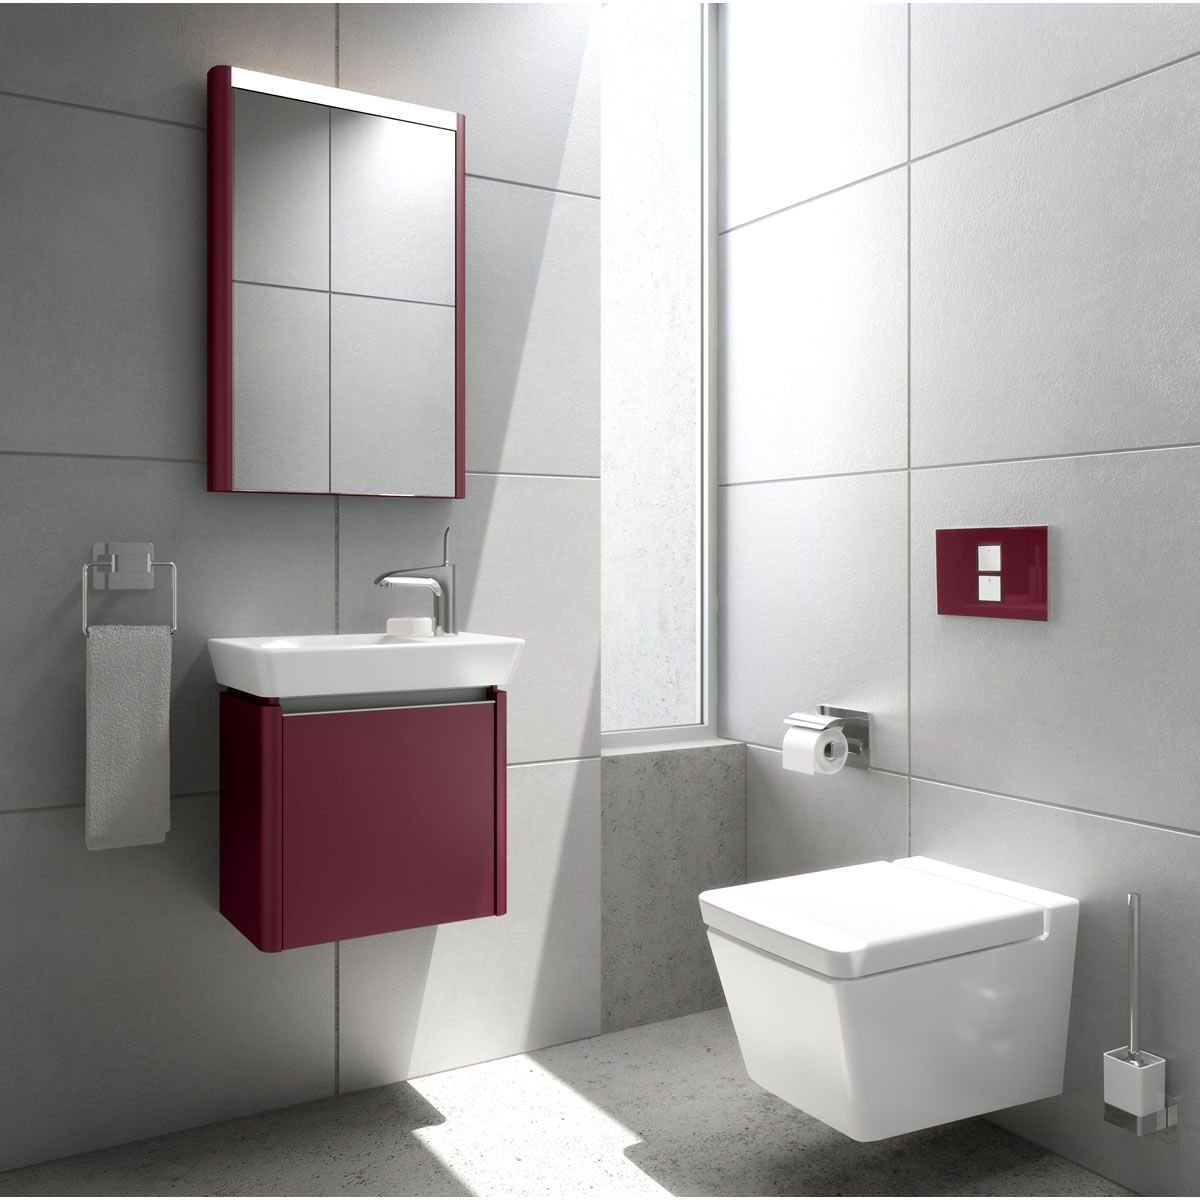 vitra t4 wall hung wc uk bathrooms. Black Bedroom Furniture Sets. Home Design Ideas